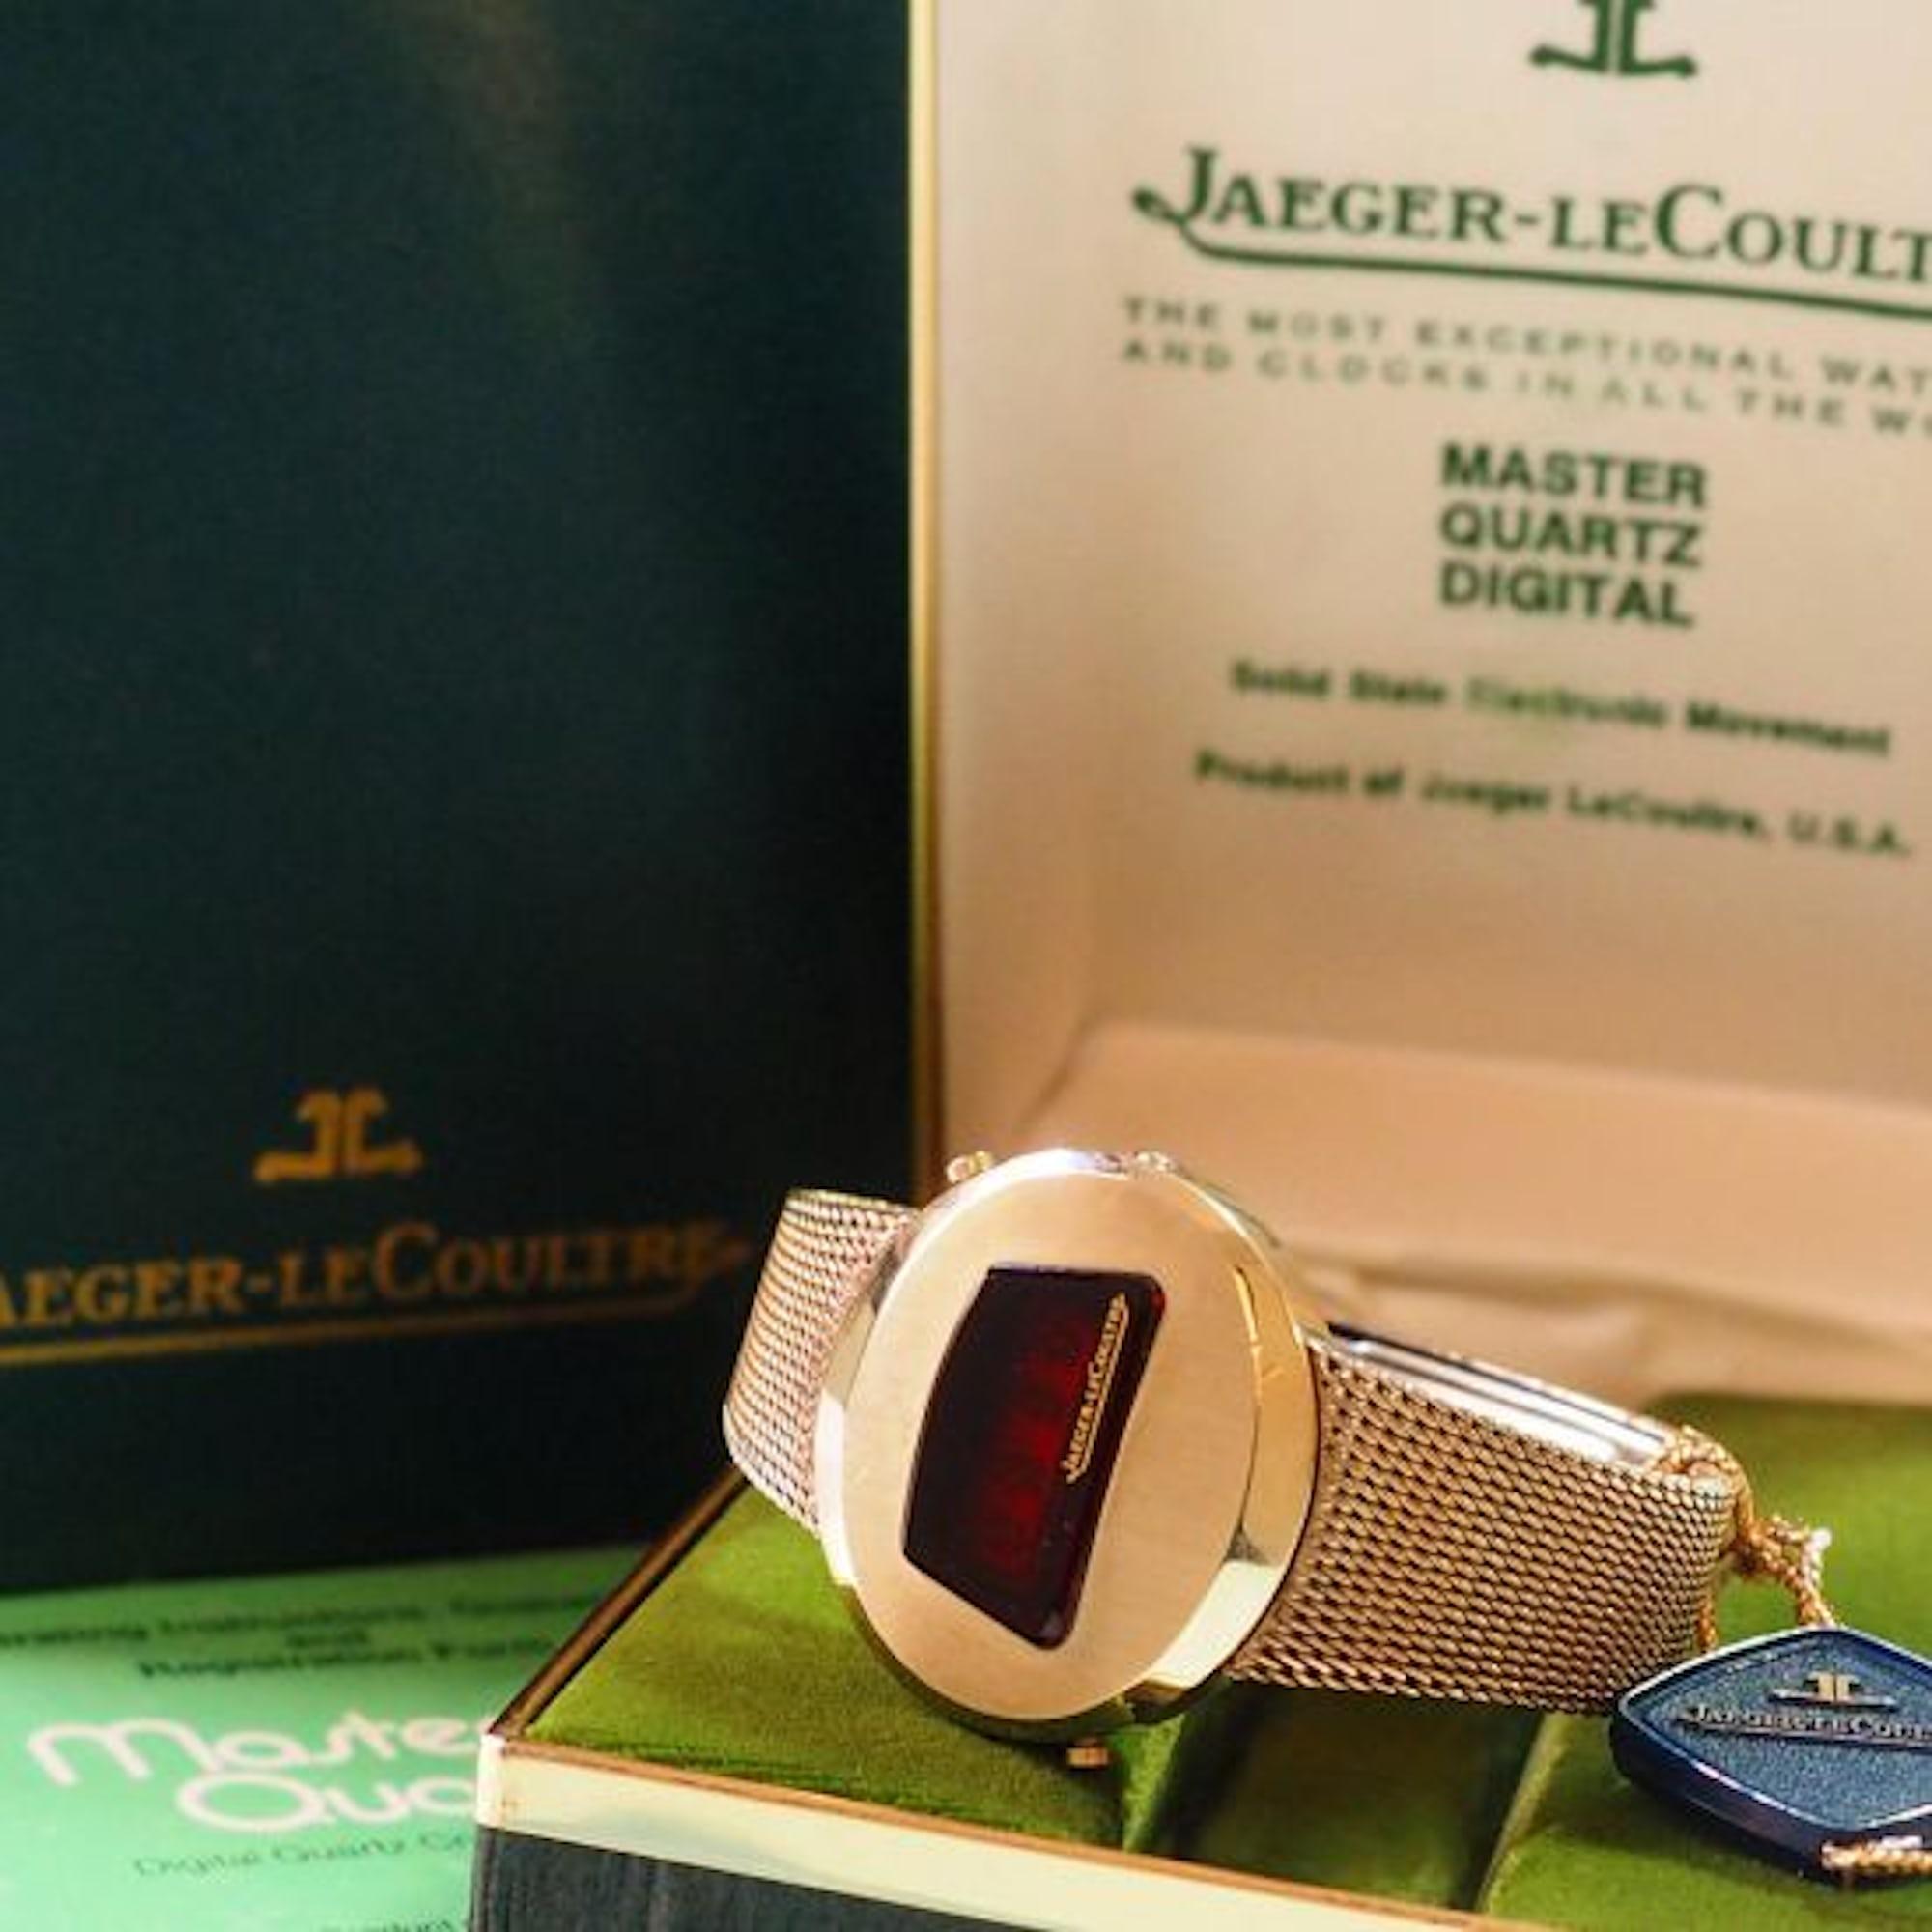 Jaeger-LeCoultre Master Quartz Digital full set